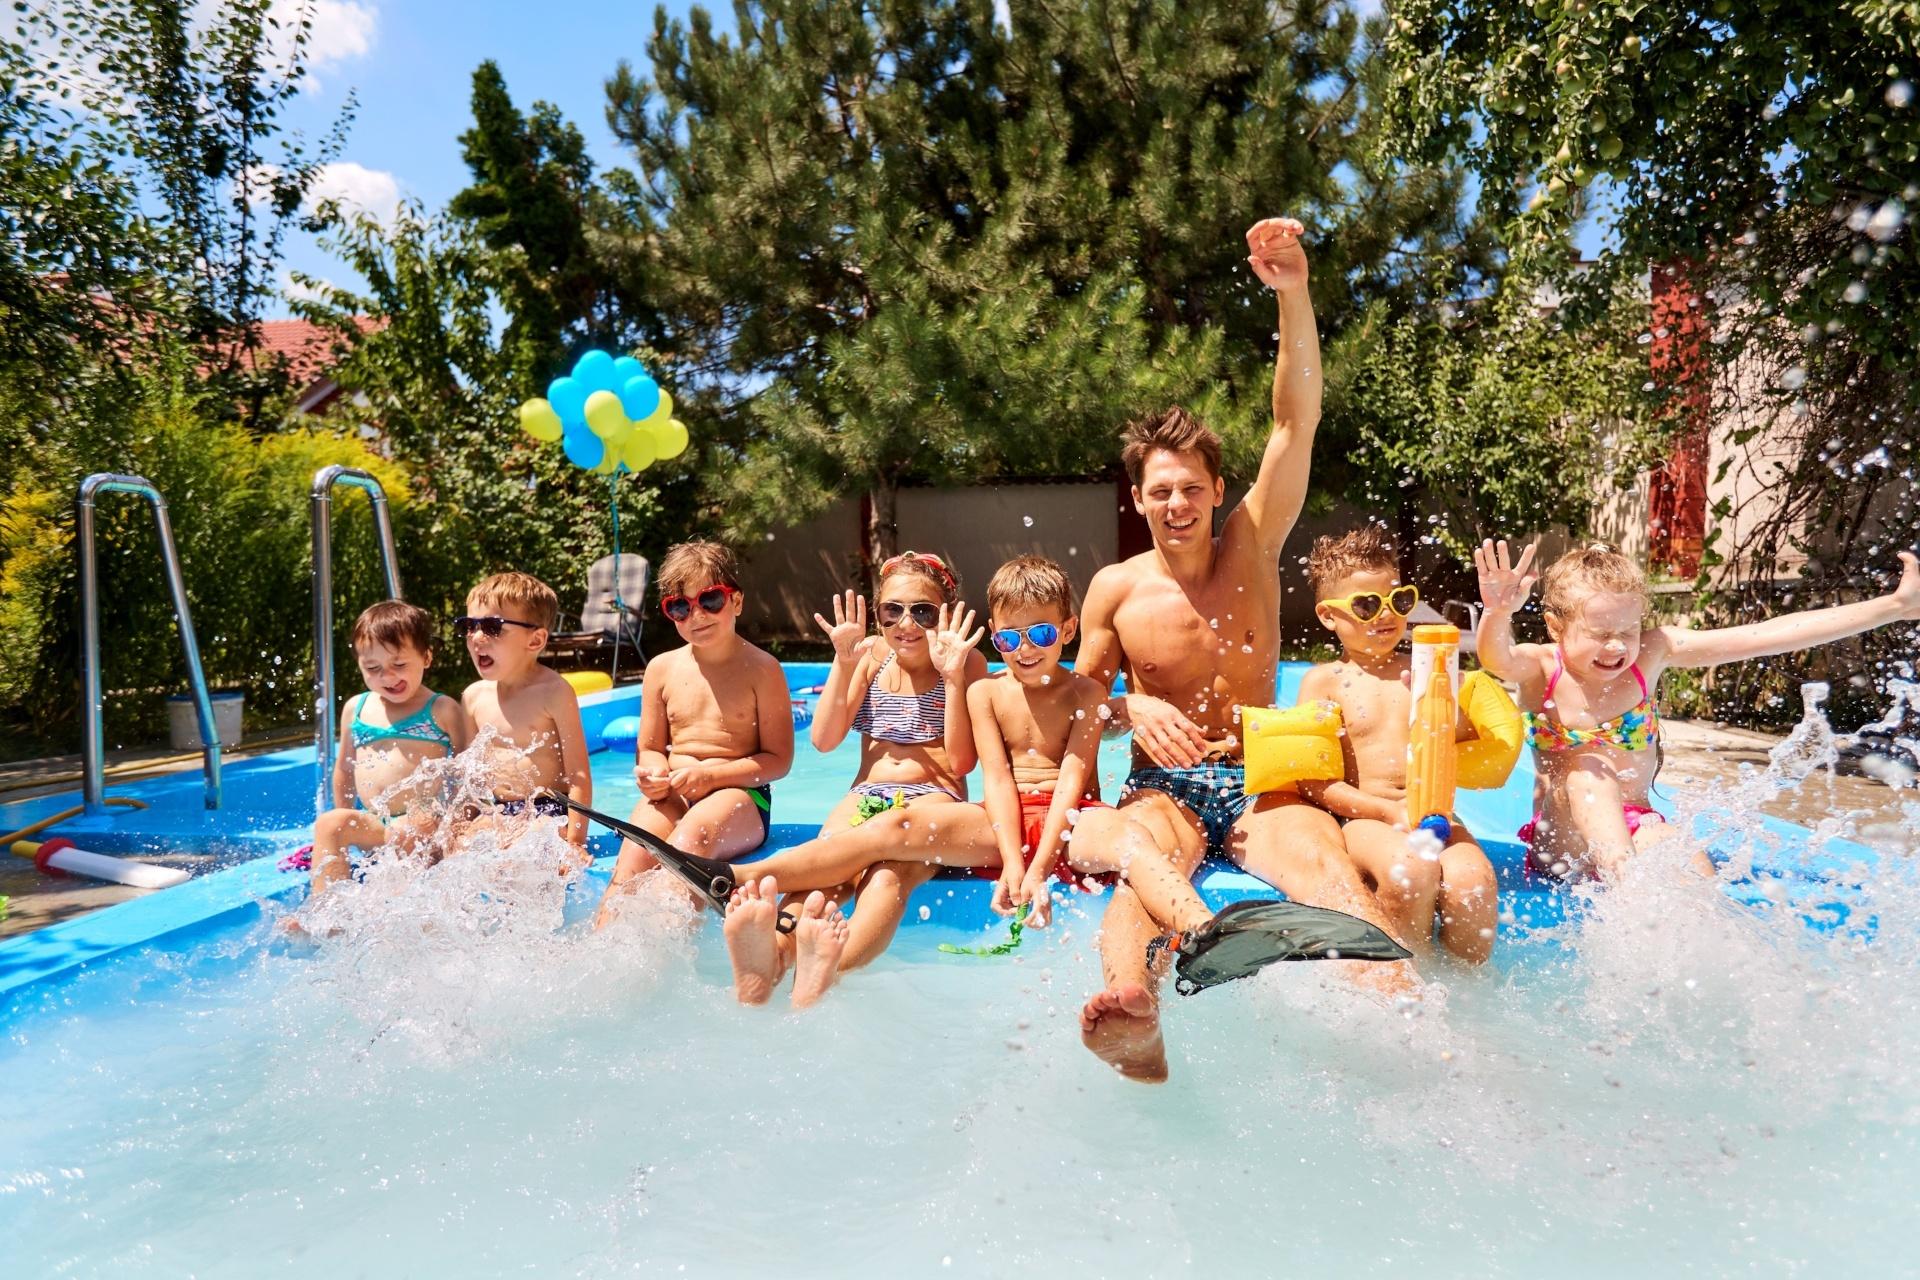 Pool Services Repairs Installations-150236-edited.jpg